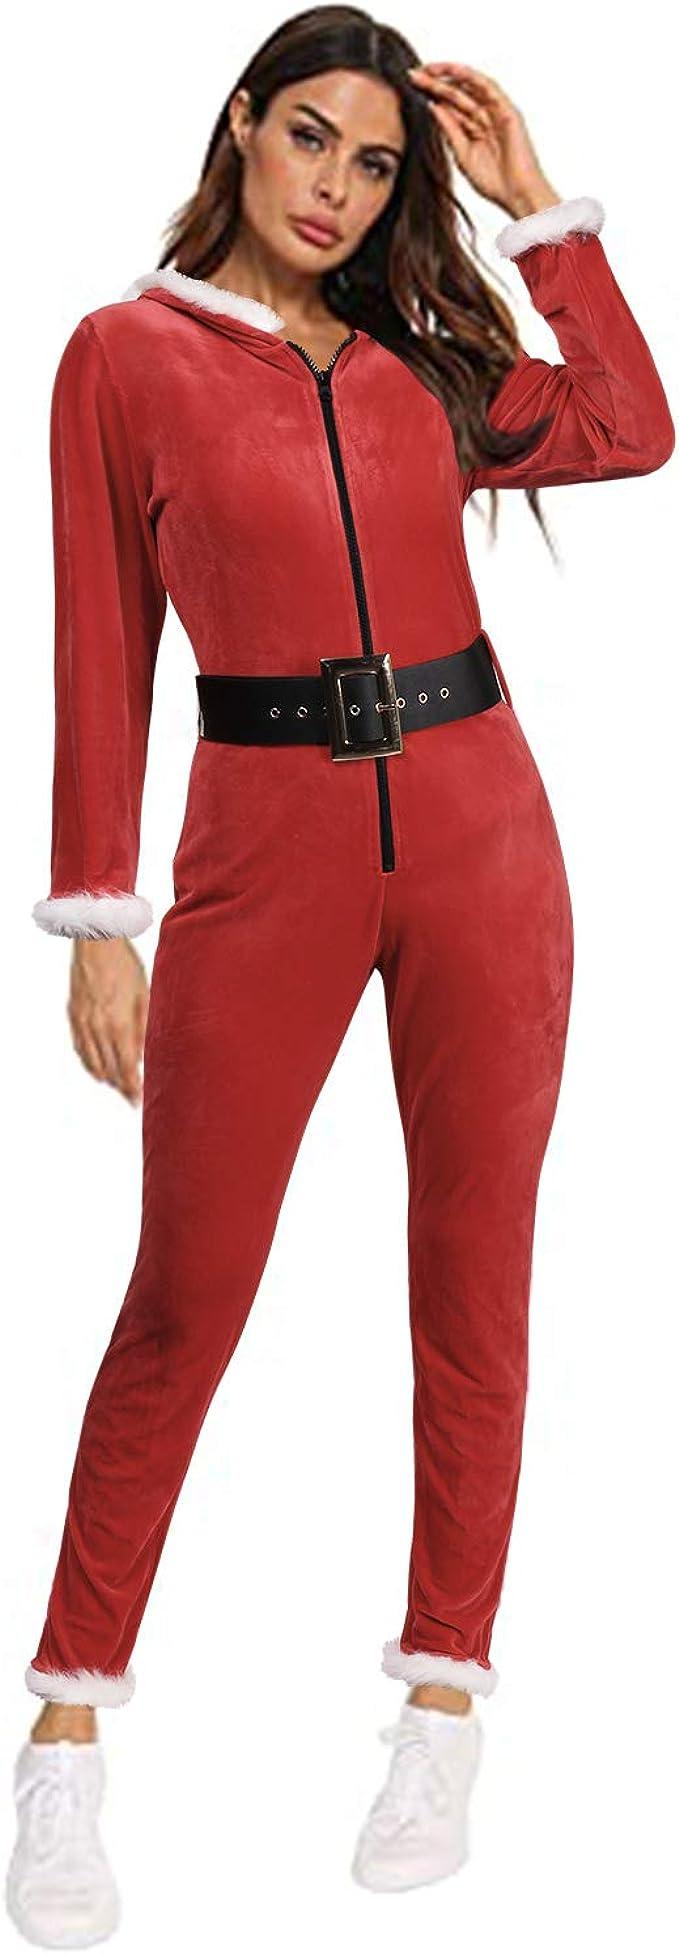 GIKING Onsies ropa de dormir feo Navidad pijama con capucha ...